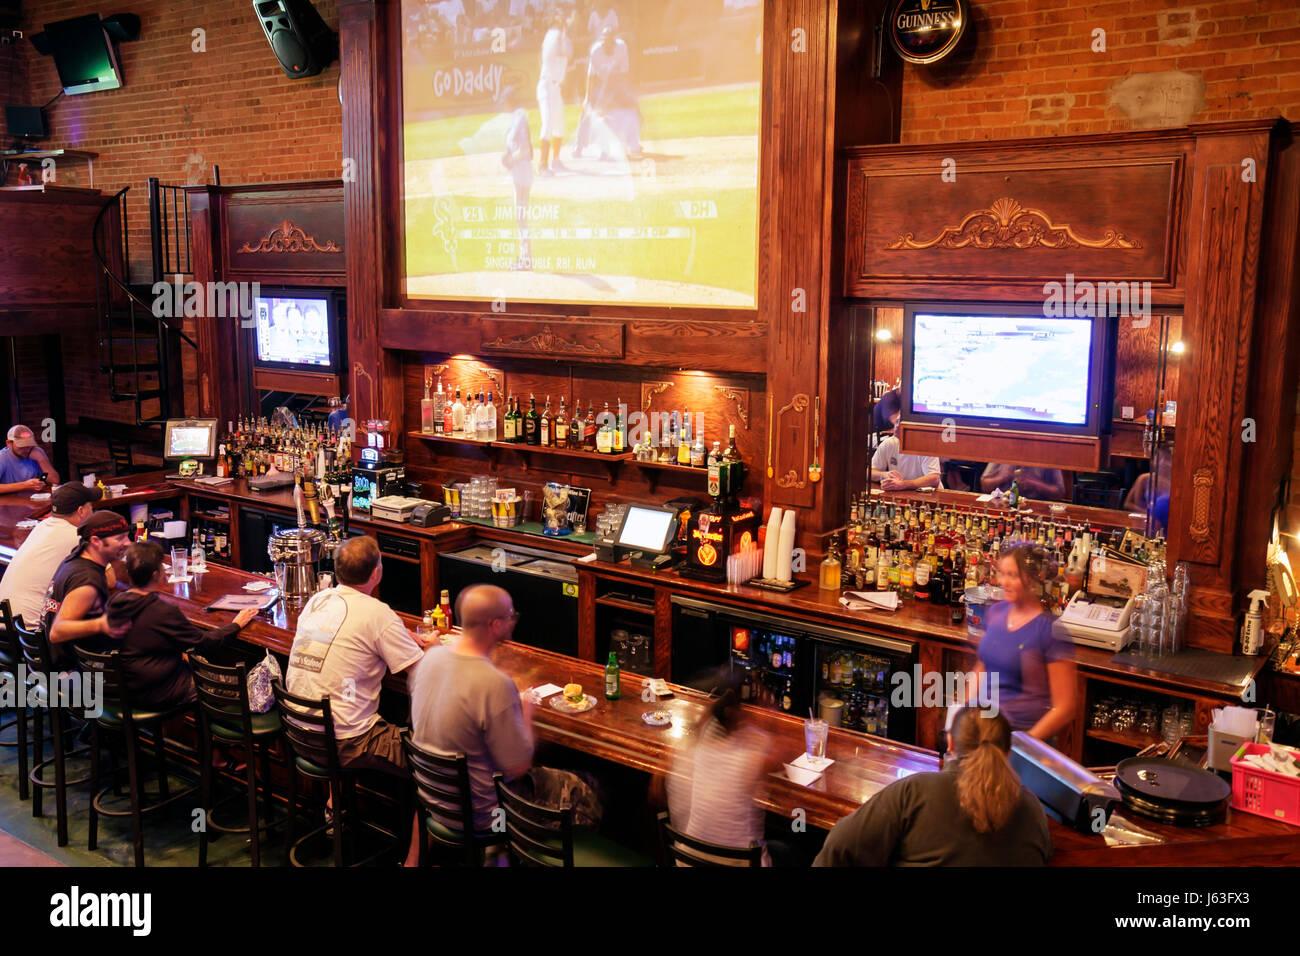 Indiana Chesterton Hooligans Pub and Grub Nightclub restaurant former china factory wood bar tv television screen - Stock Image